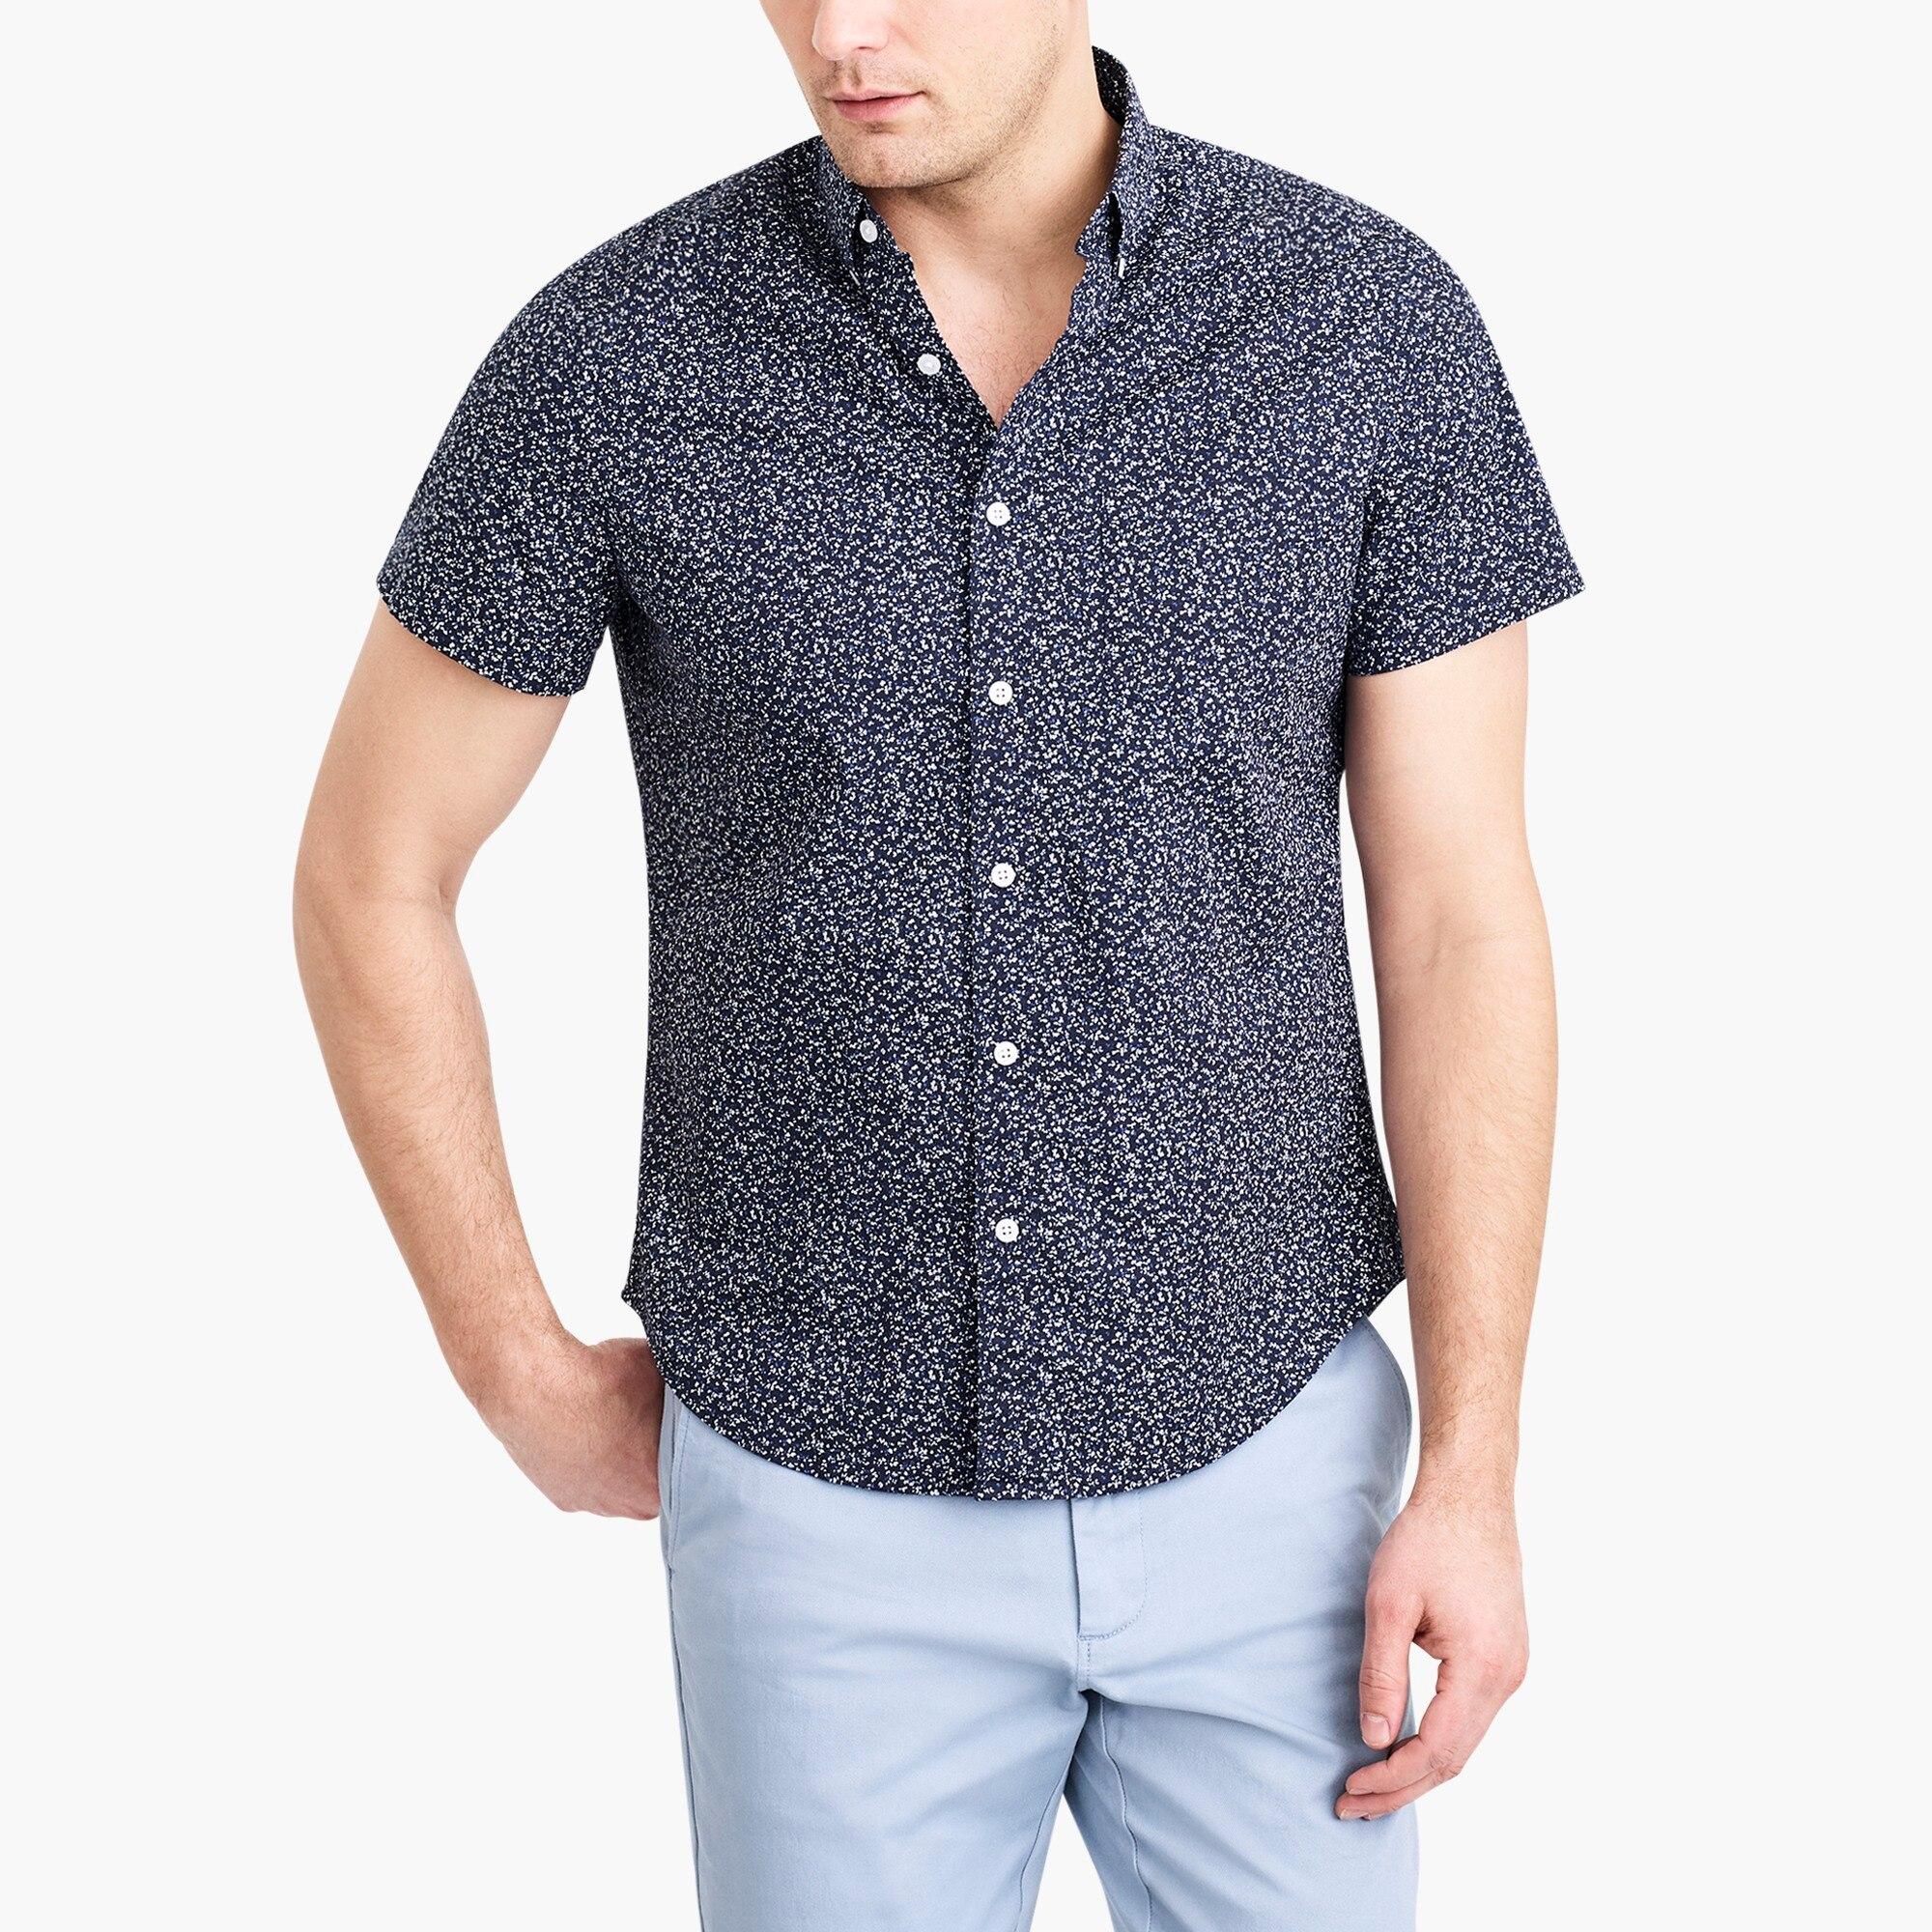 factory mens Floral printed slim flex casual short sleeve shirt